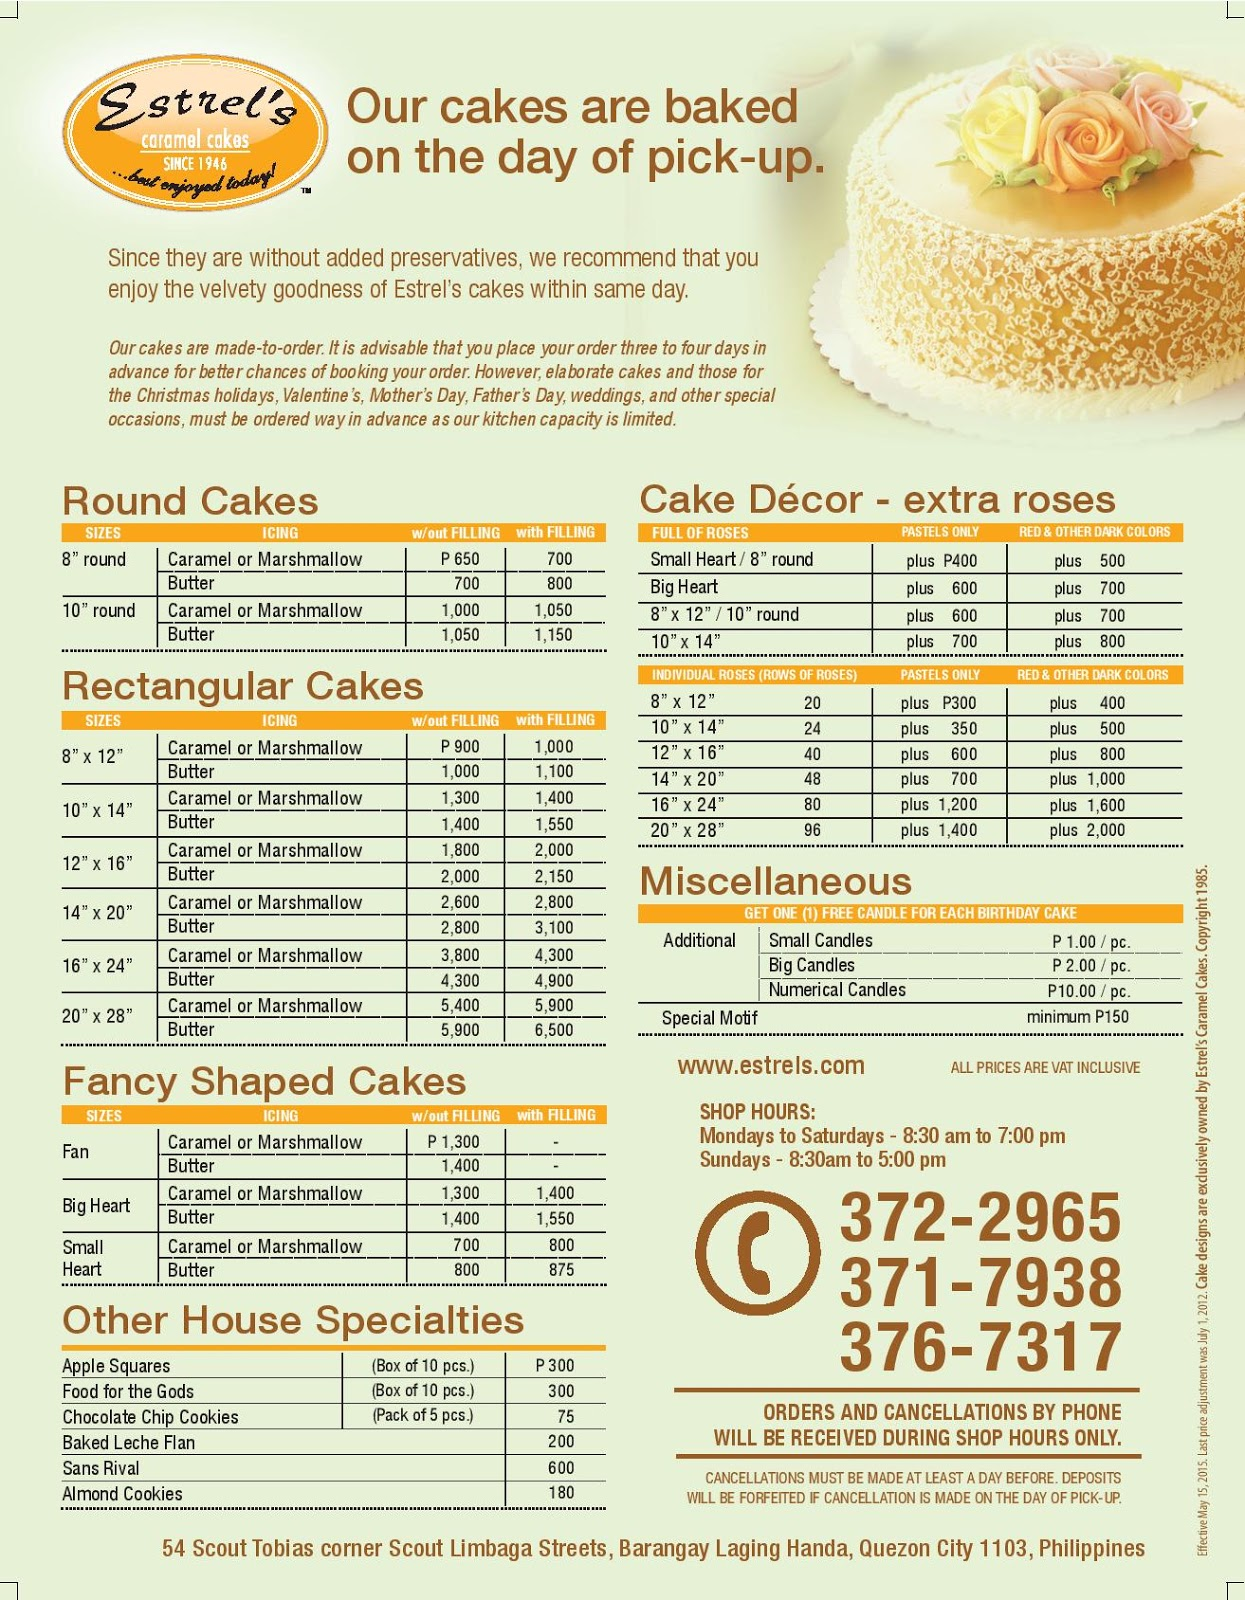 Contis Cake Price Philippines List